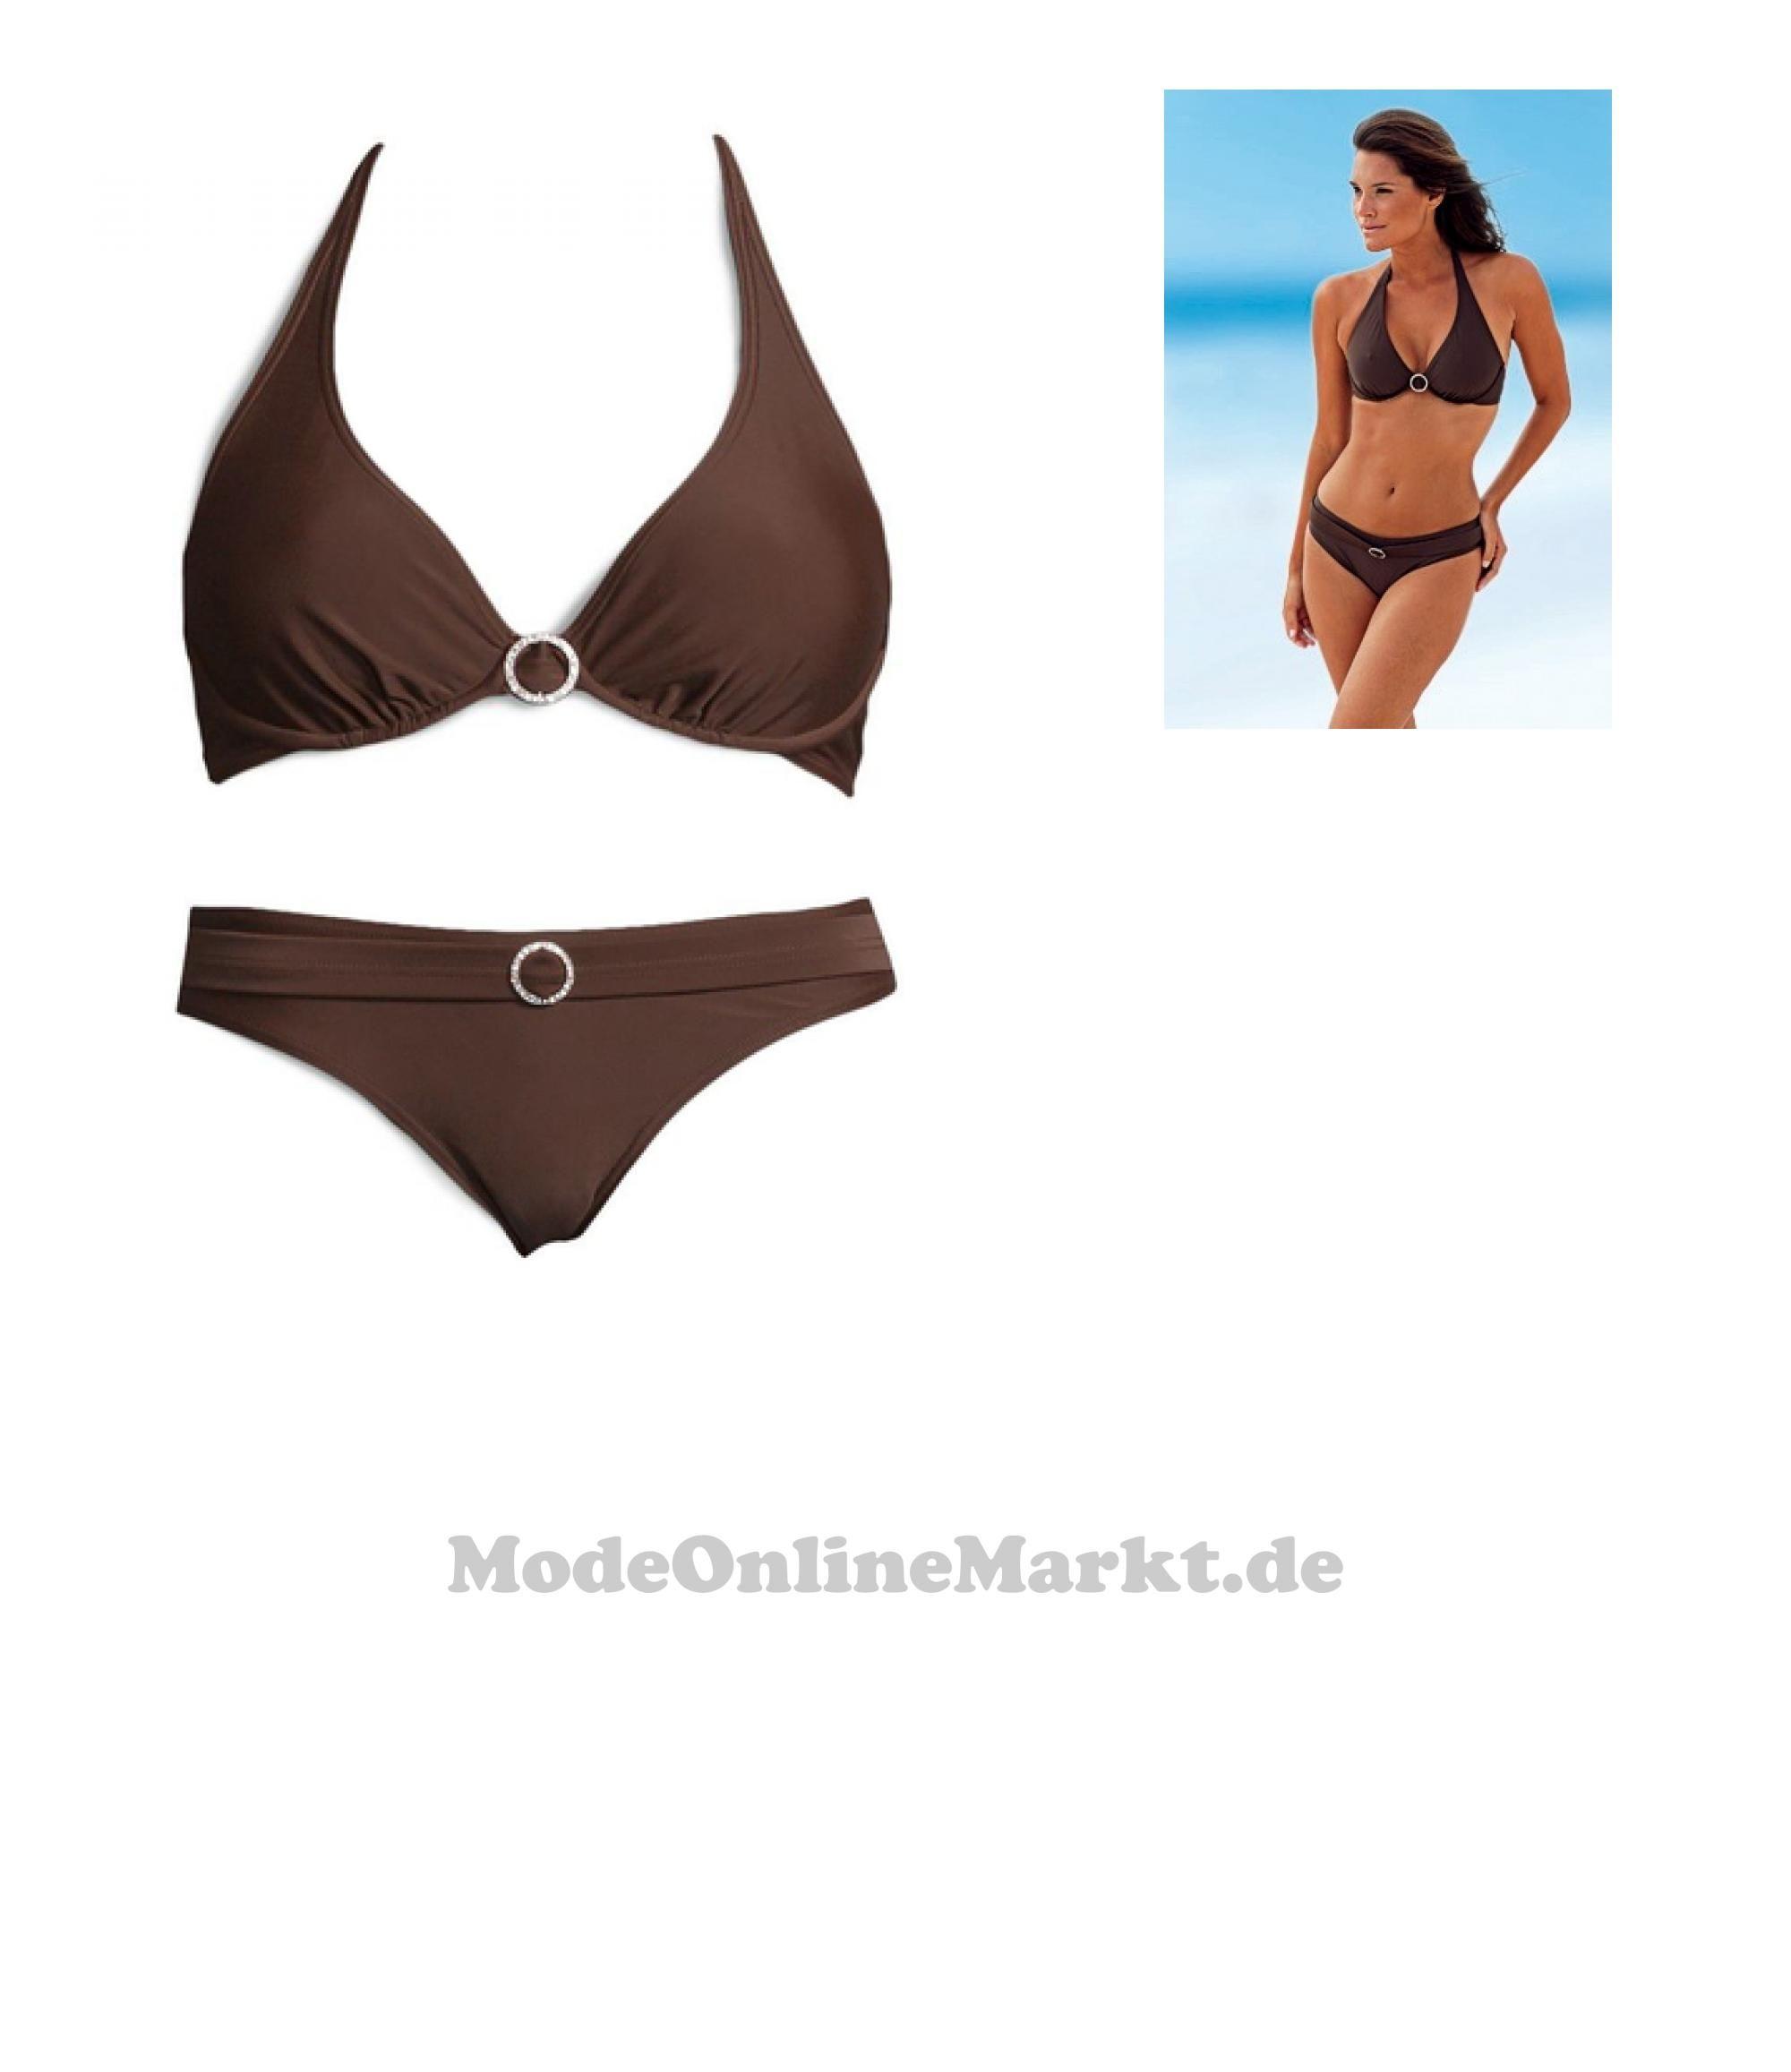 4893865195525 | #LASCANA #Damen #Triangel-Bügel-Bikini #braun